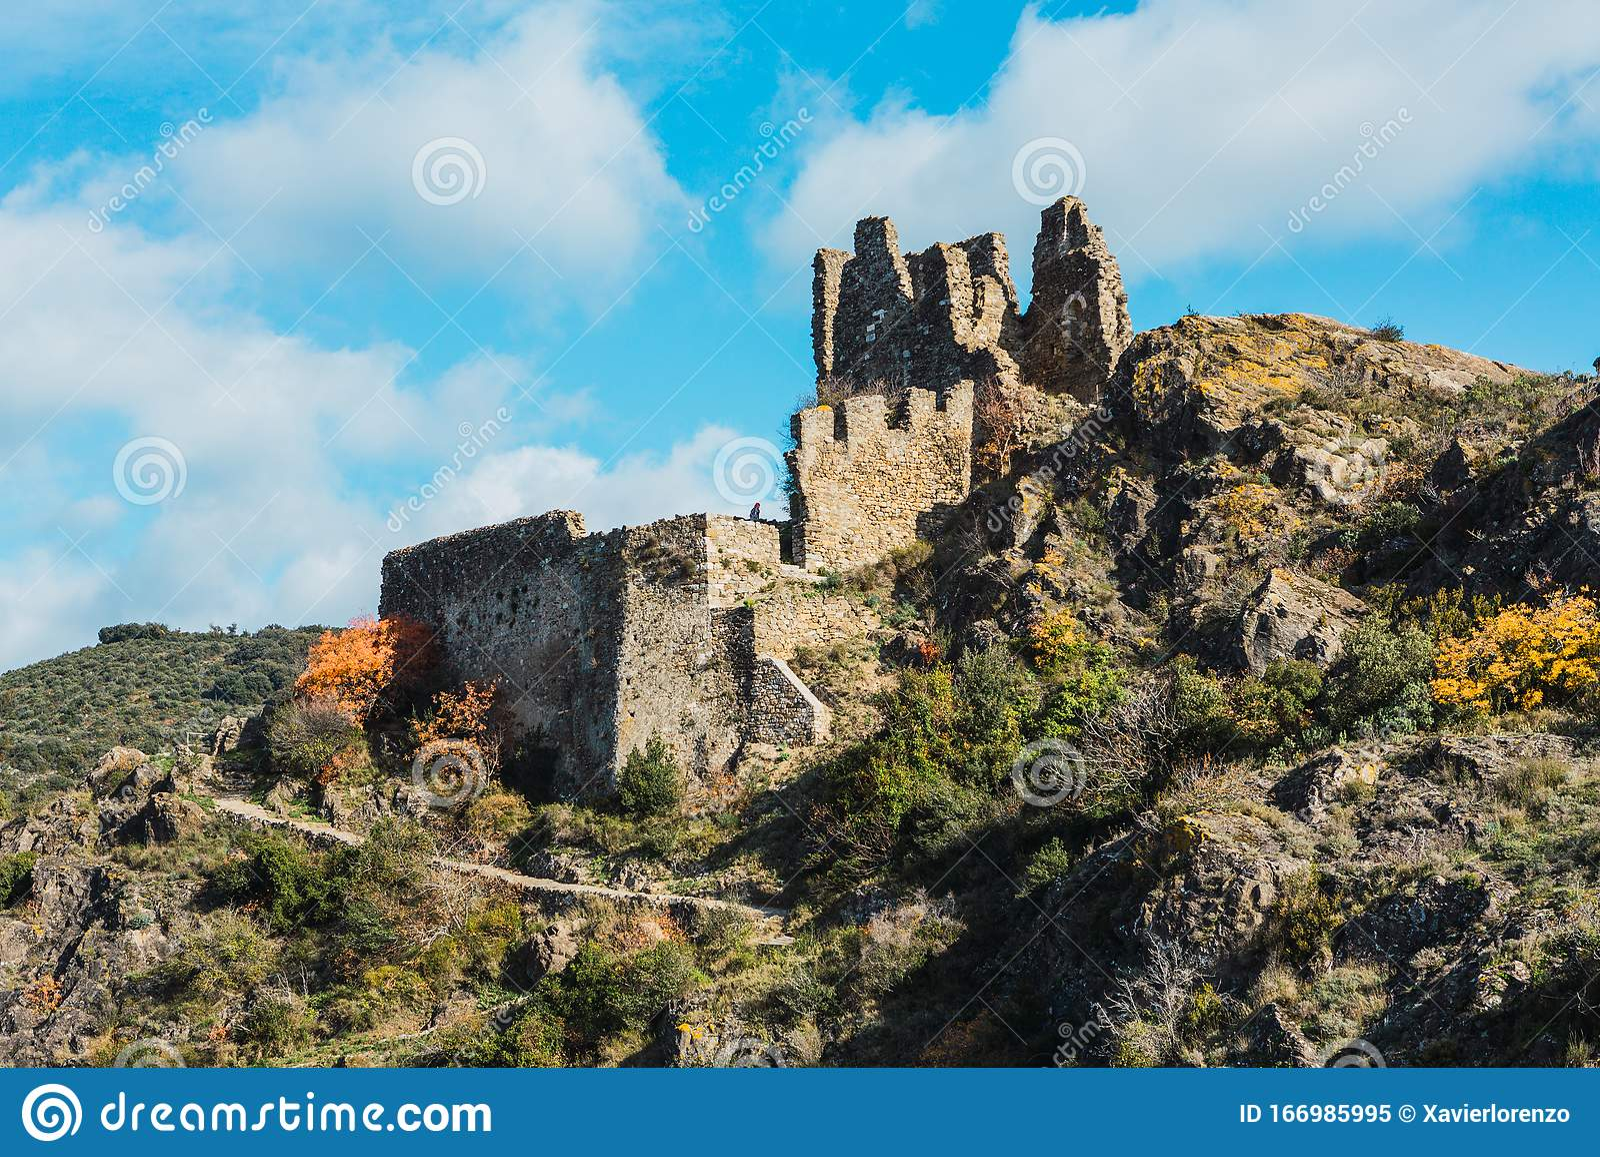 20 Cathar Castles Photos   Free & Royalty Free Stock Photos from ...